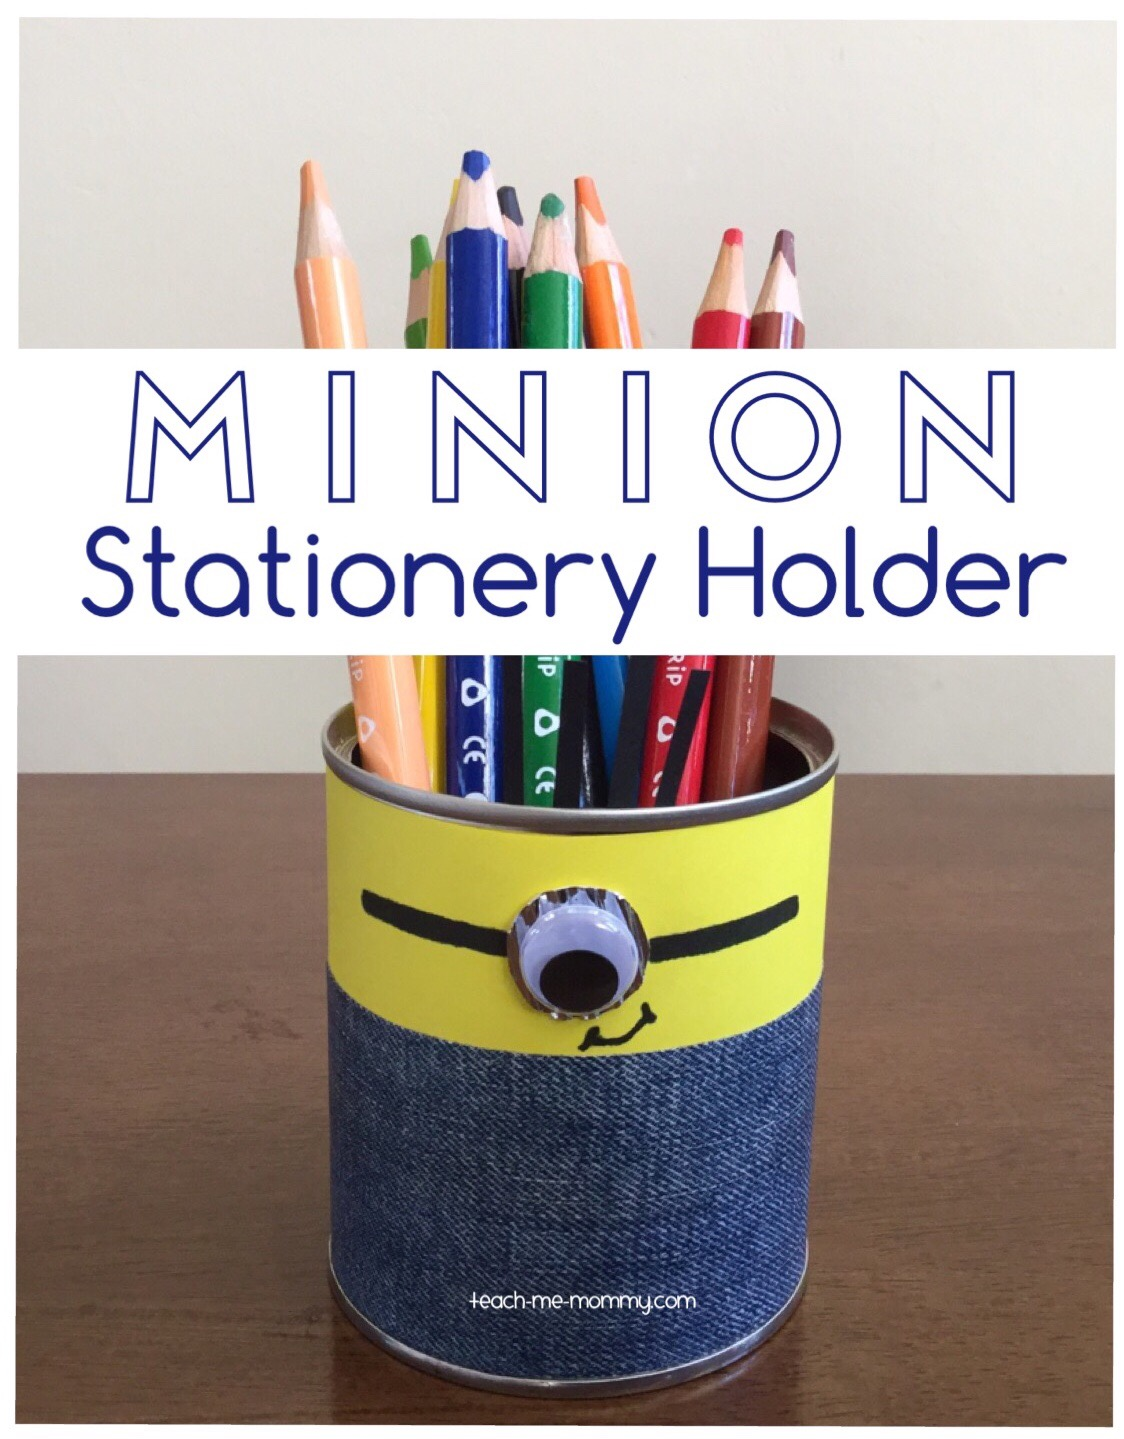 minion stationery holder